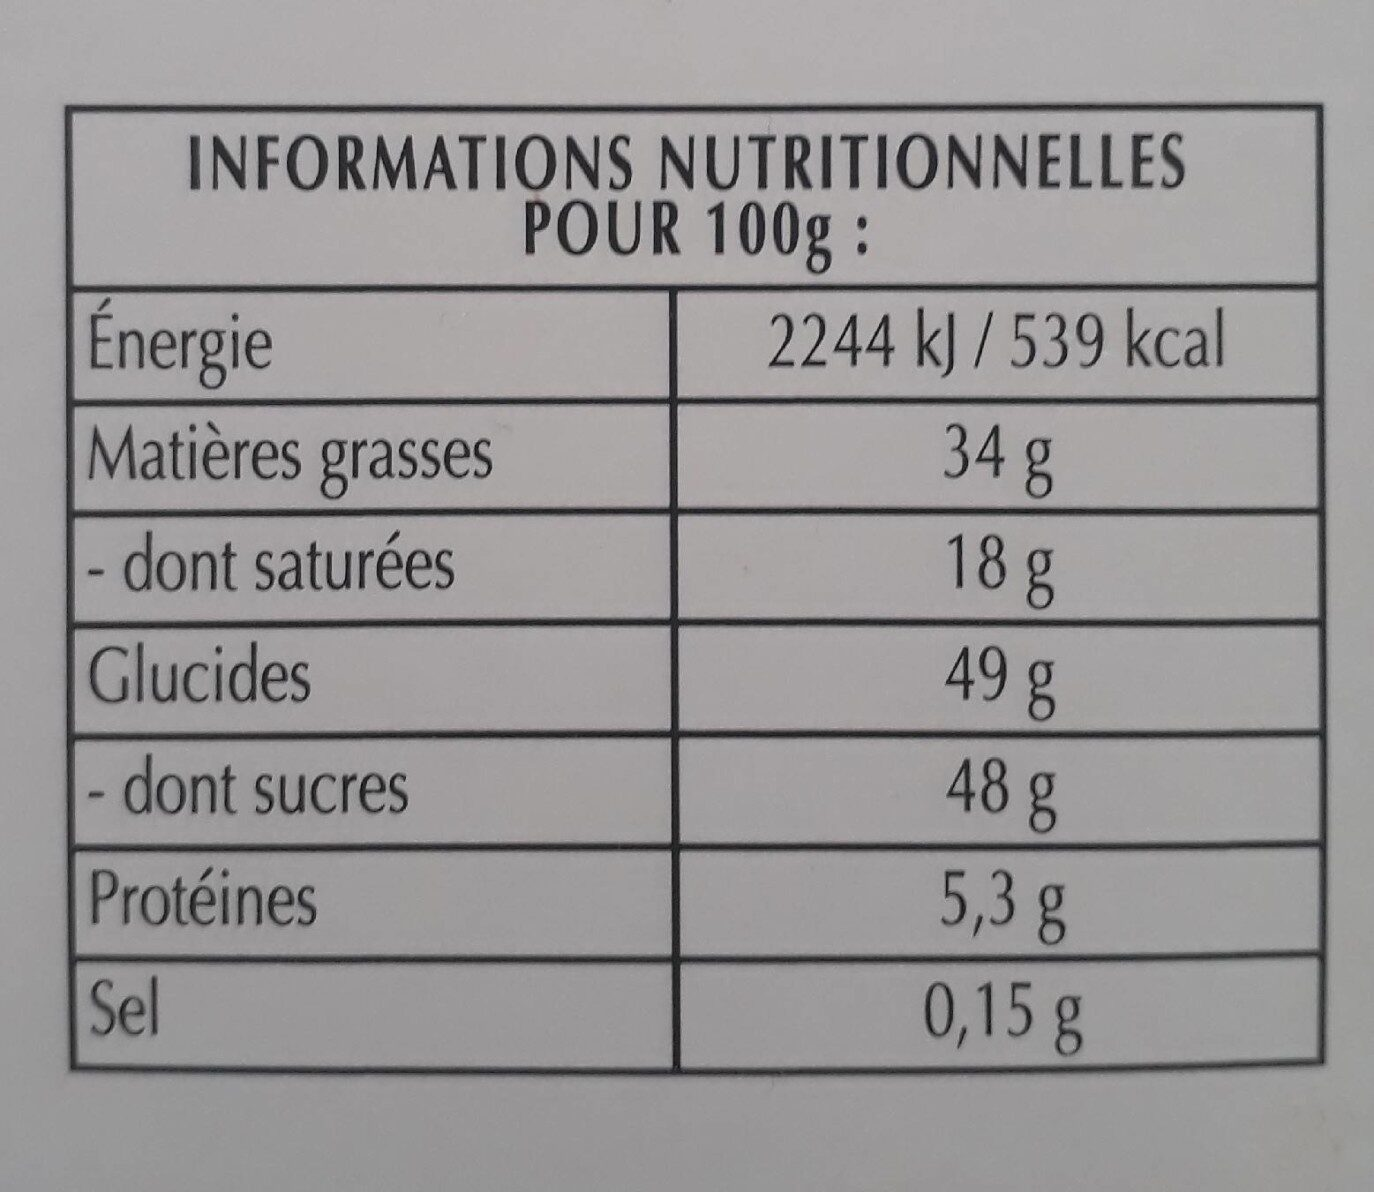 Chocolat noir noix de pécan caramélisée - Información nutricional - fr